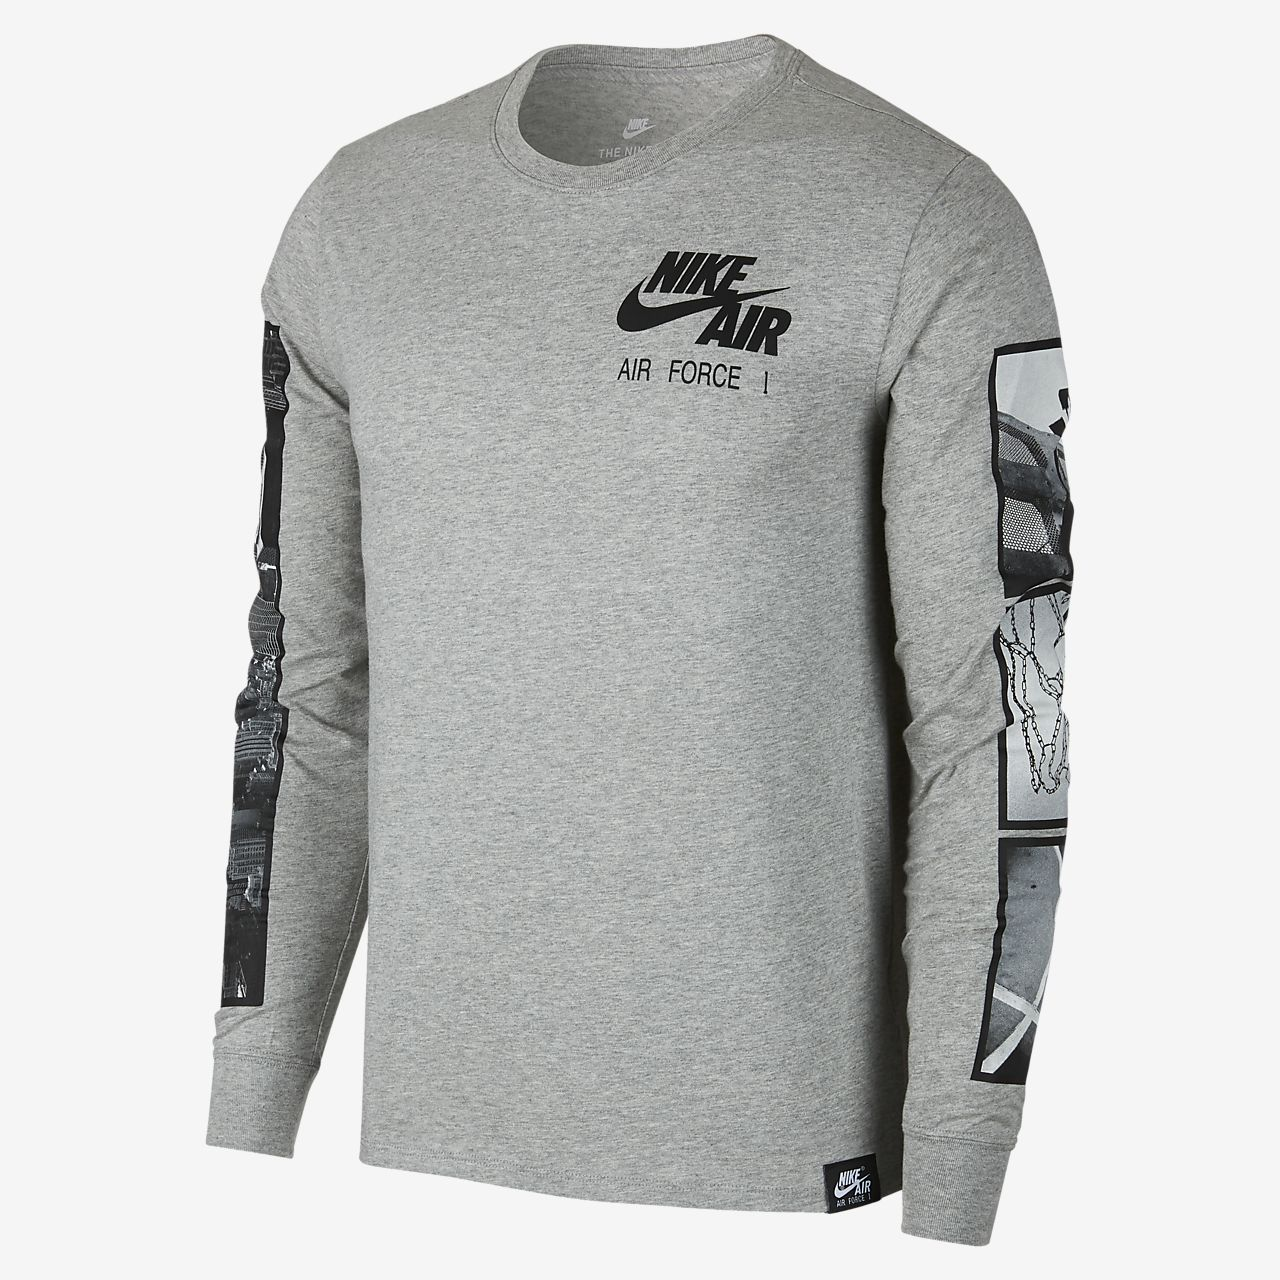 Nike Sportswear Air Force 1 男子长袖T恤